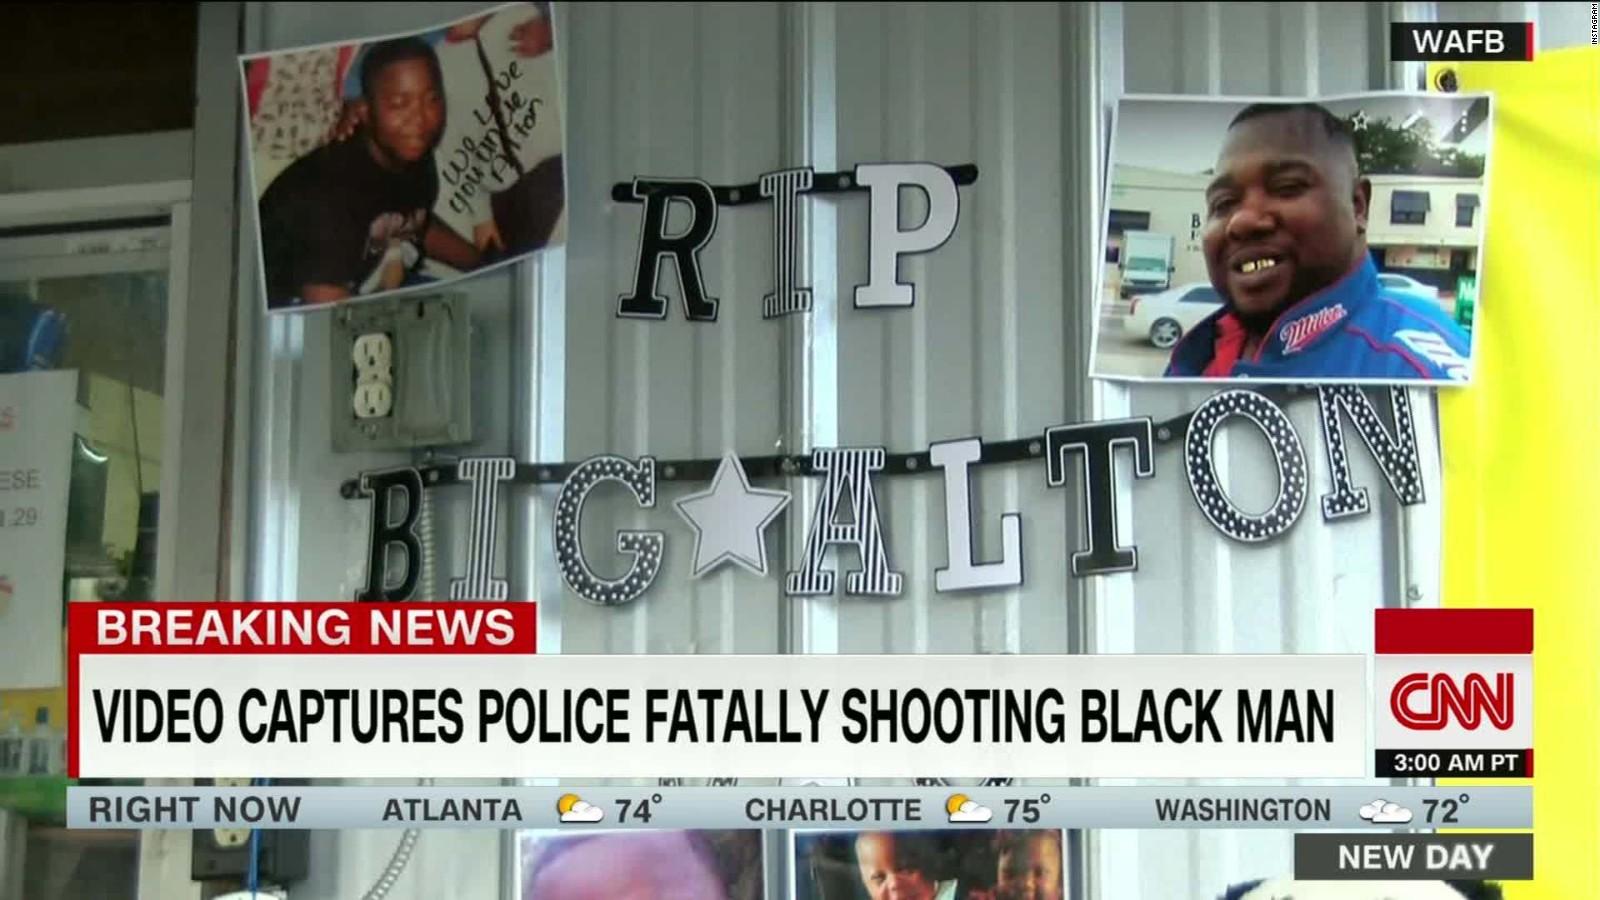 Alton Sterling shooting: Homeless man made 911 call, source